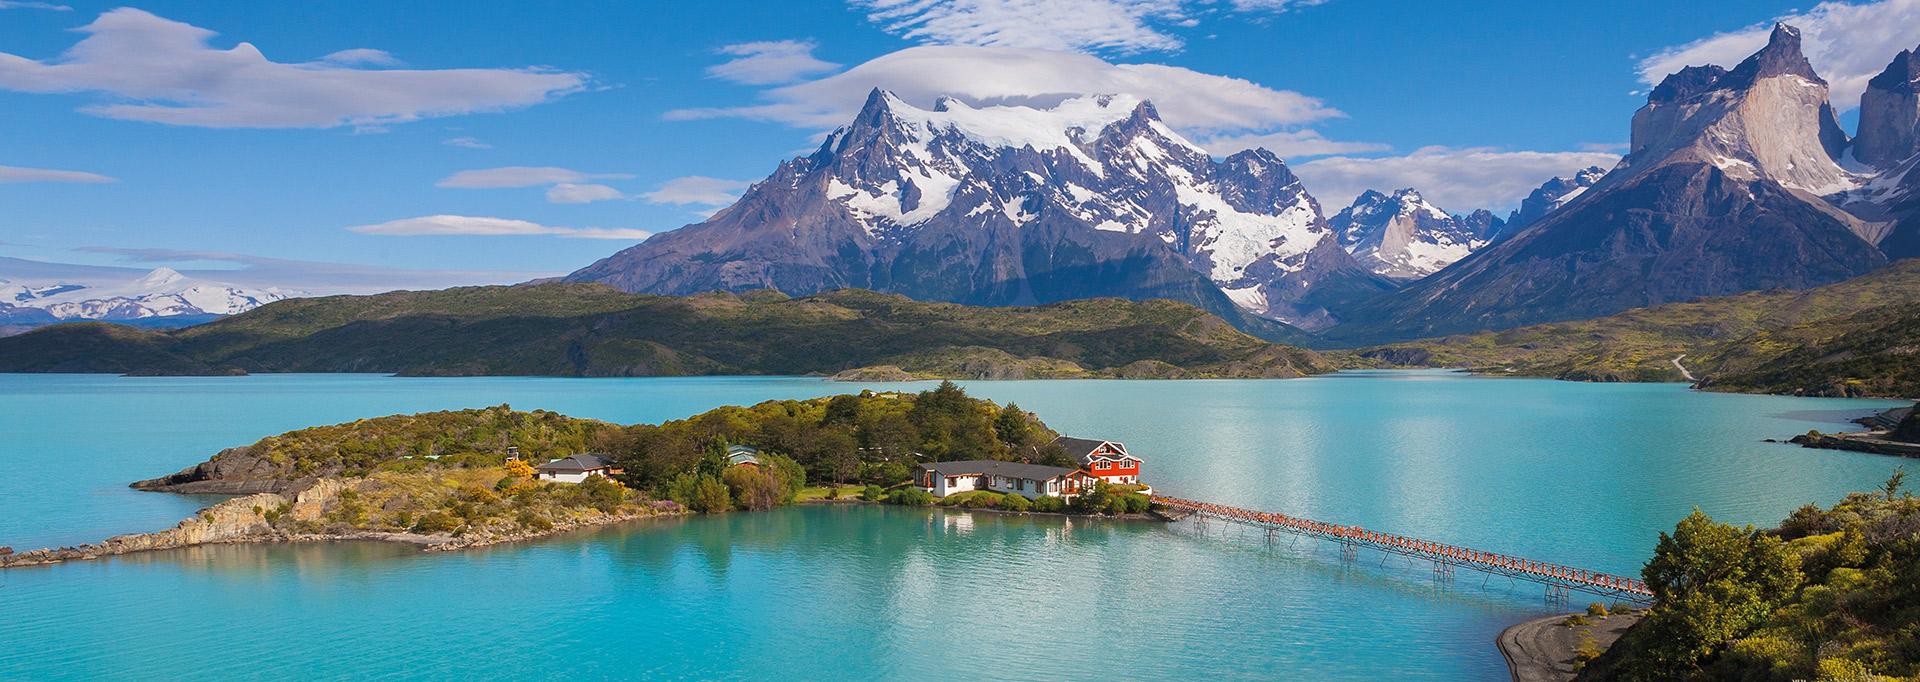 Group Tour Holidays To Argentina Argentina Escorted Tours